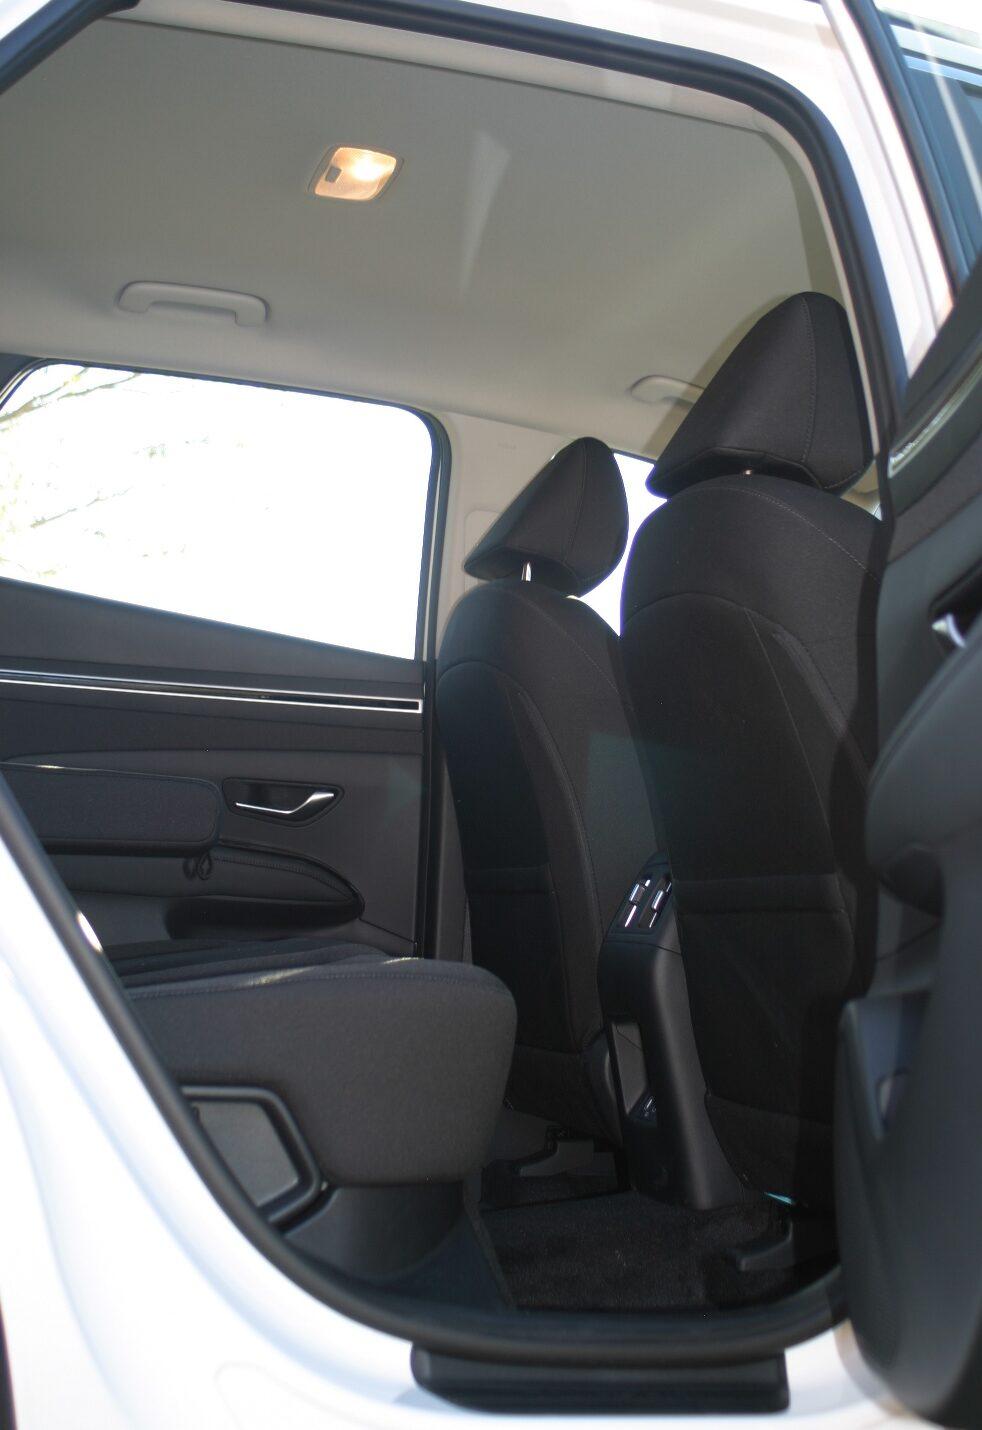 Hyundai Tucson rear foot well